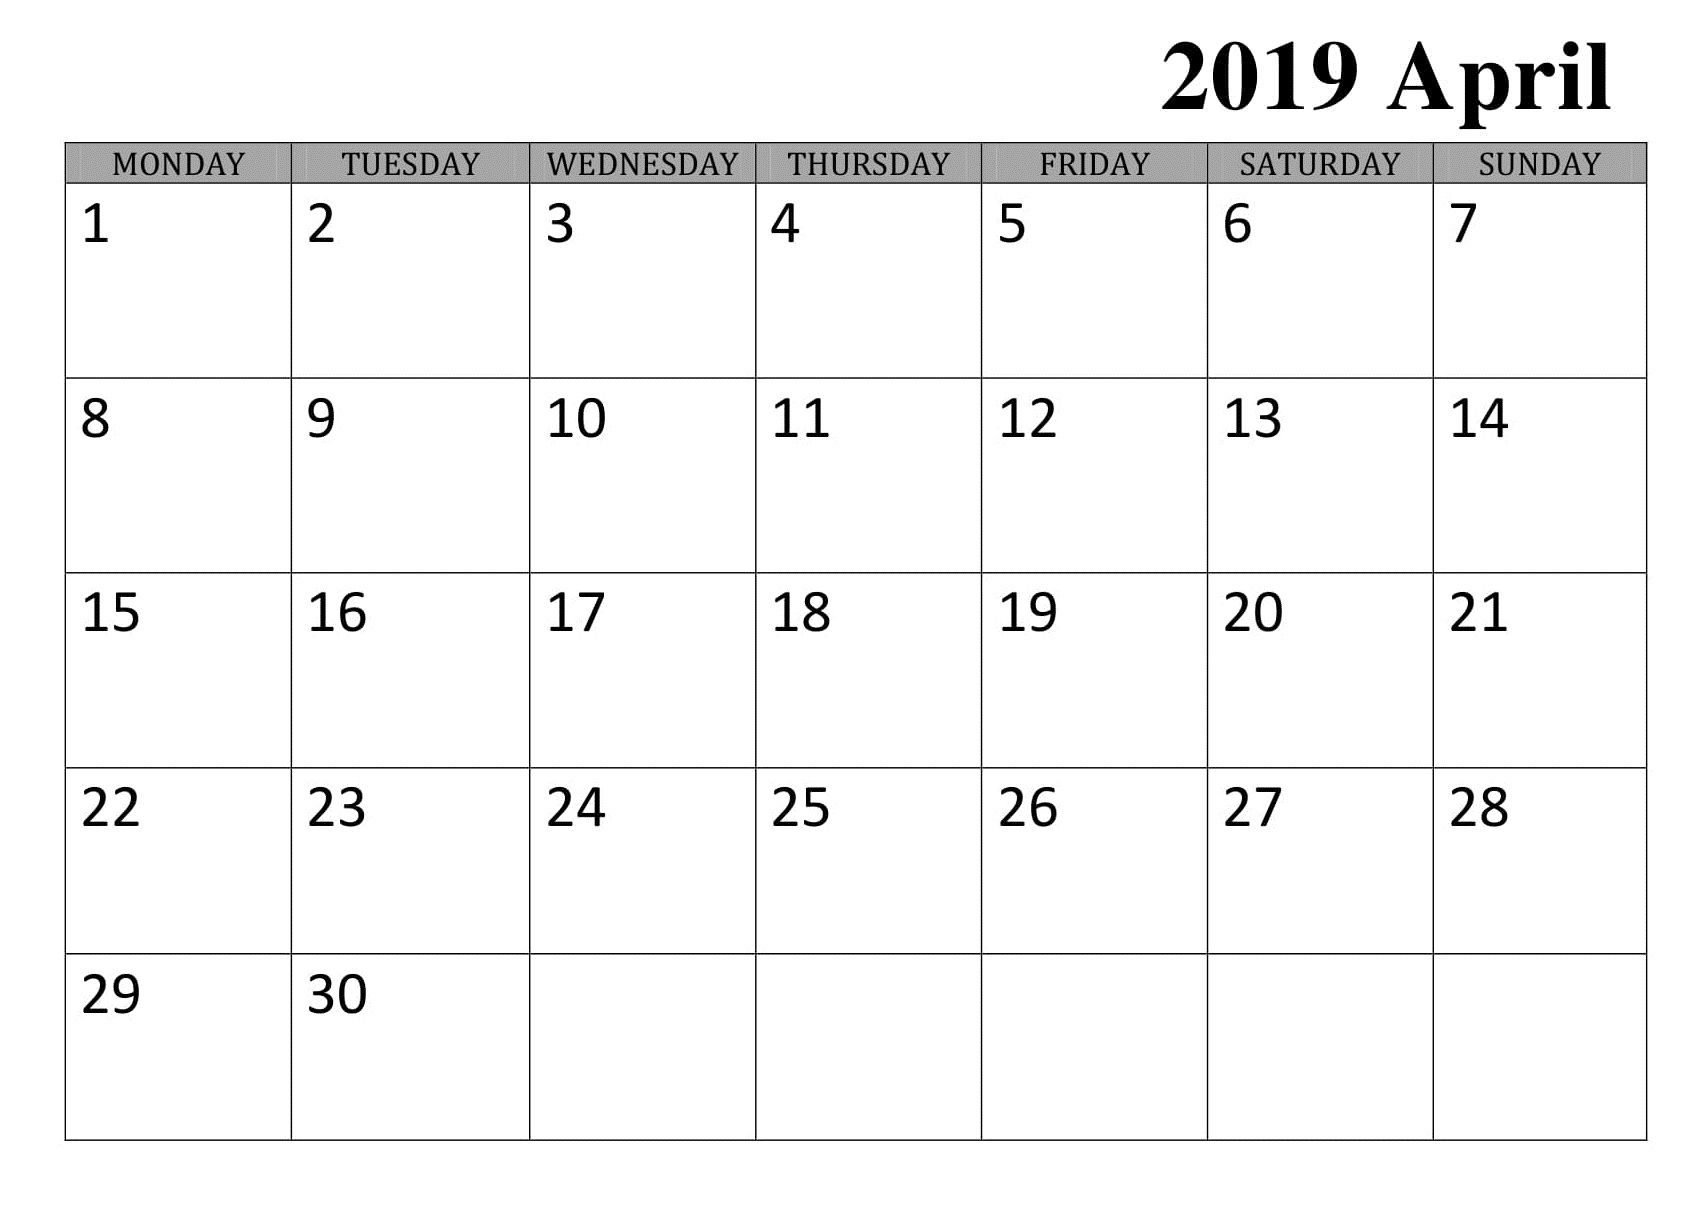 April Daily Calendar Template 2019